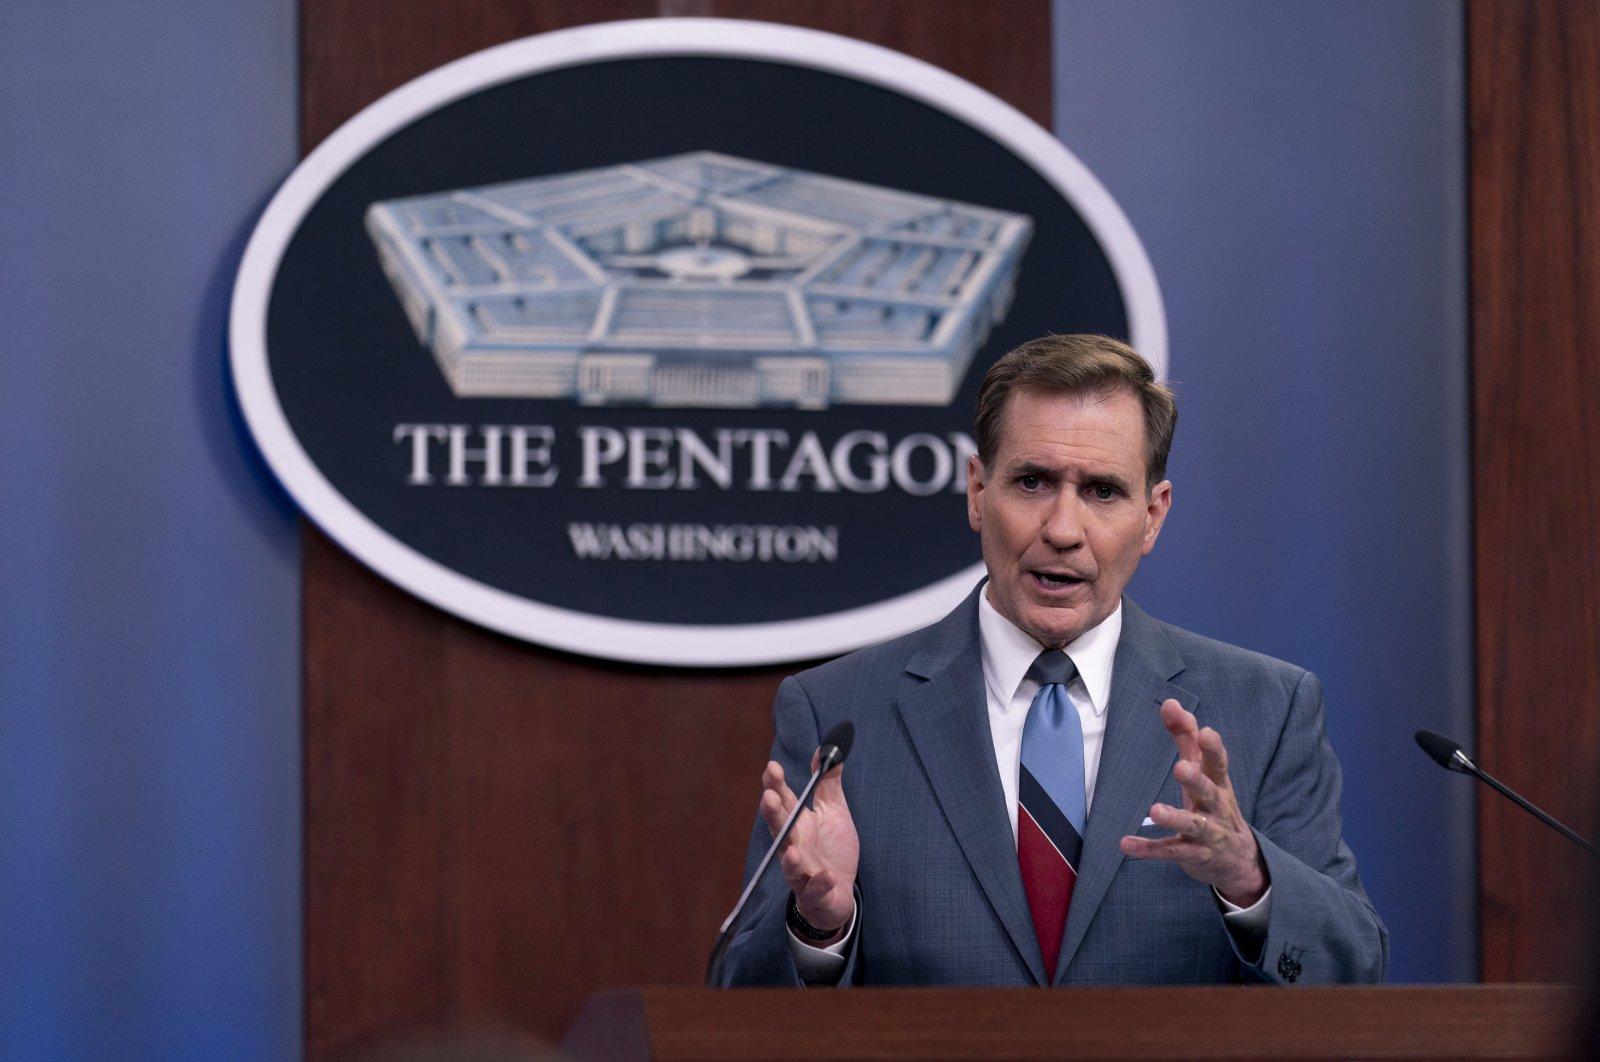 Pentagon Press Secretary John Kirby speaks during a media briefing at the Pentagon in Washington, May 26, 2021. (AP Photo)